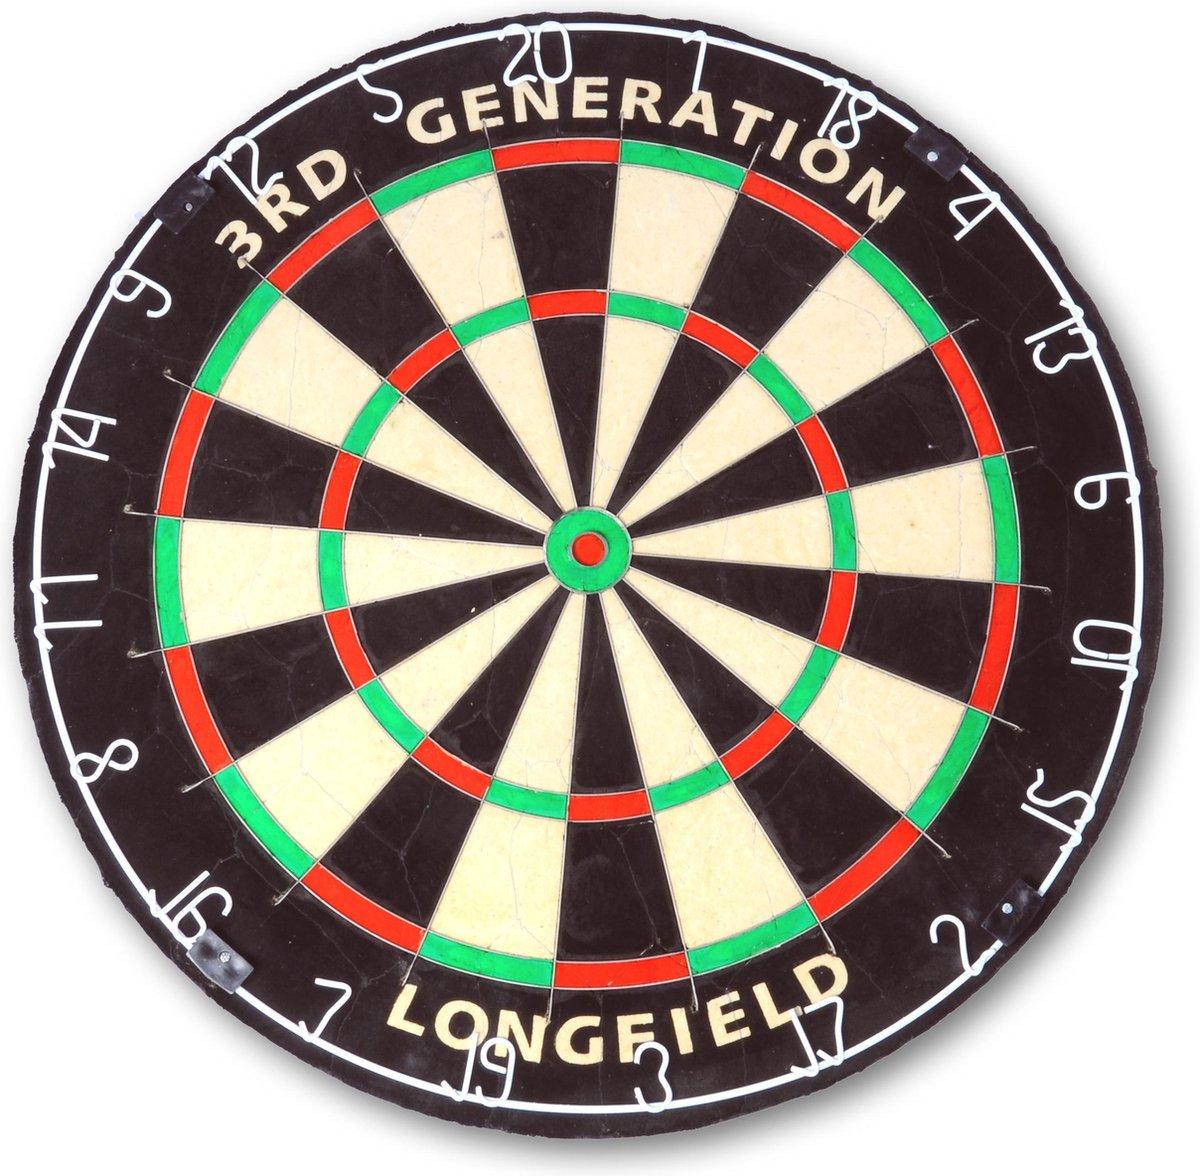 Longfield Dartbord 3RD Generation - Sisal - Dartbord